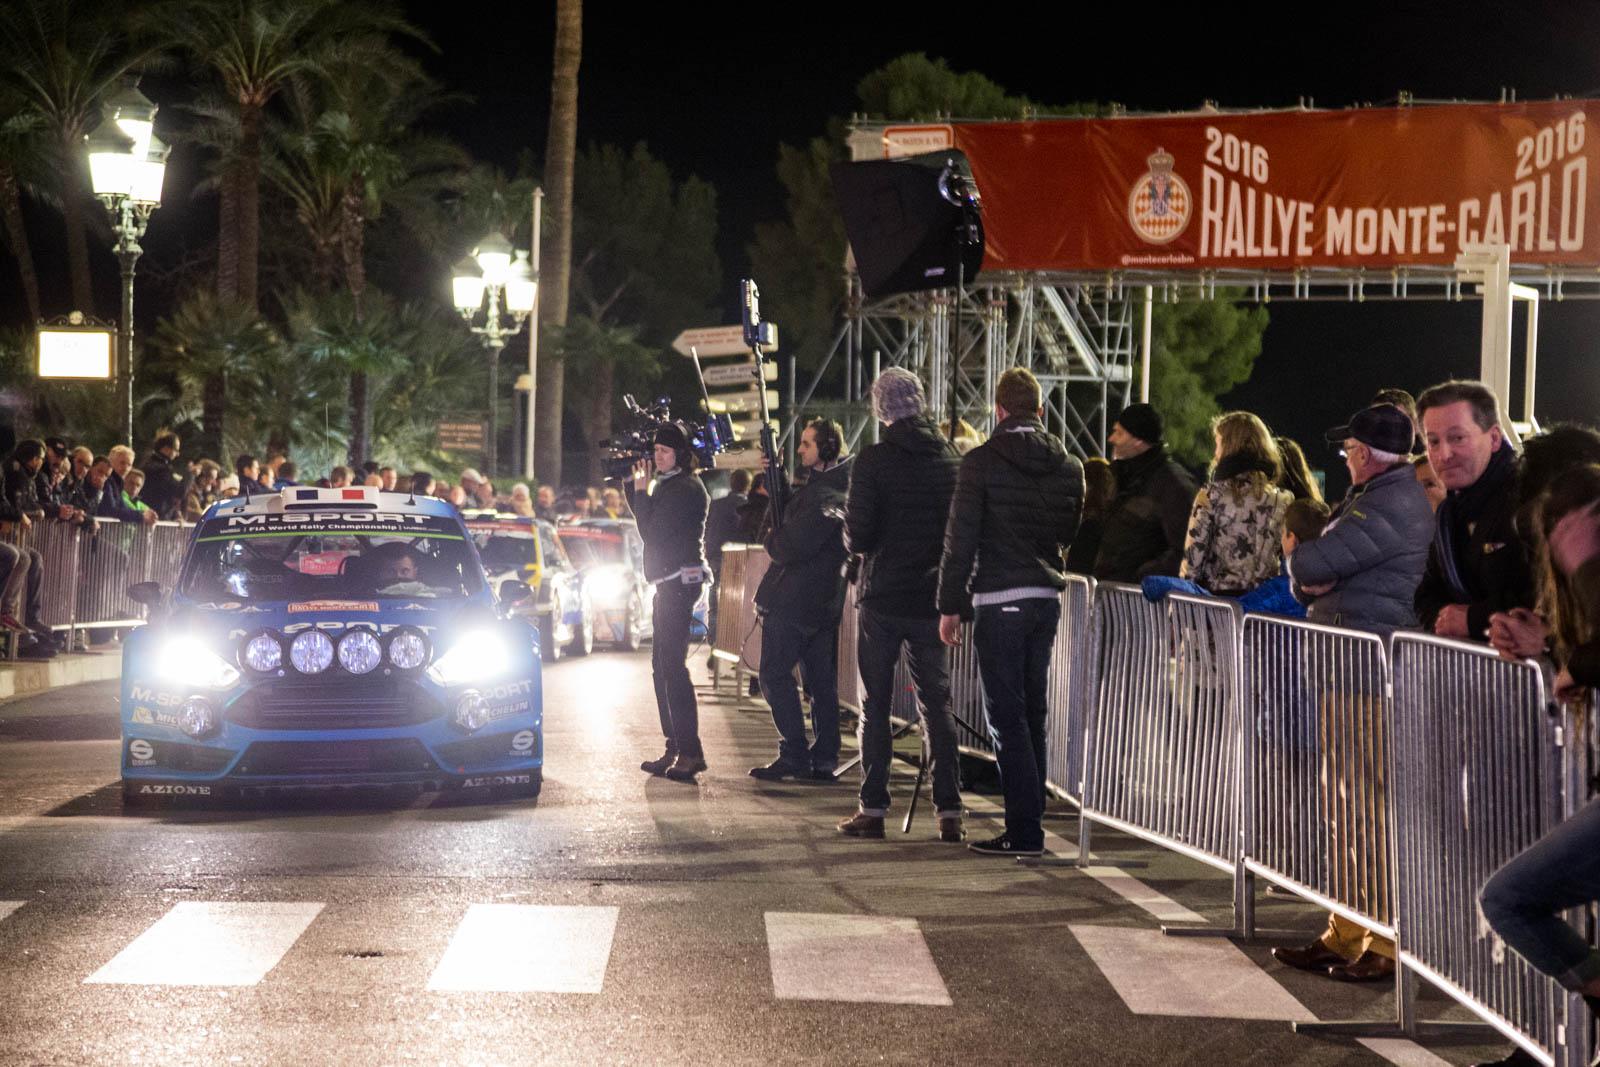 © Ivan Blanco - Rallye Monte-Carlo 2016 LR-2990.jpg